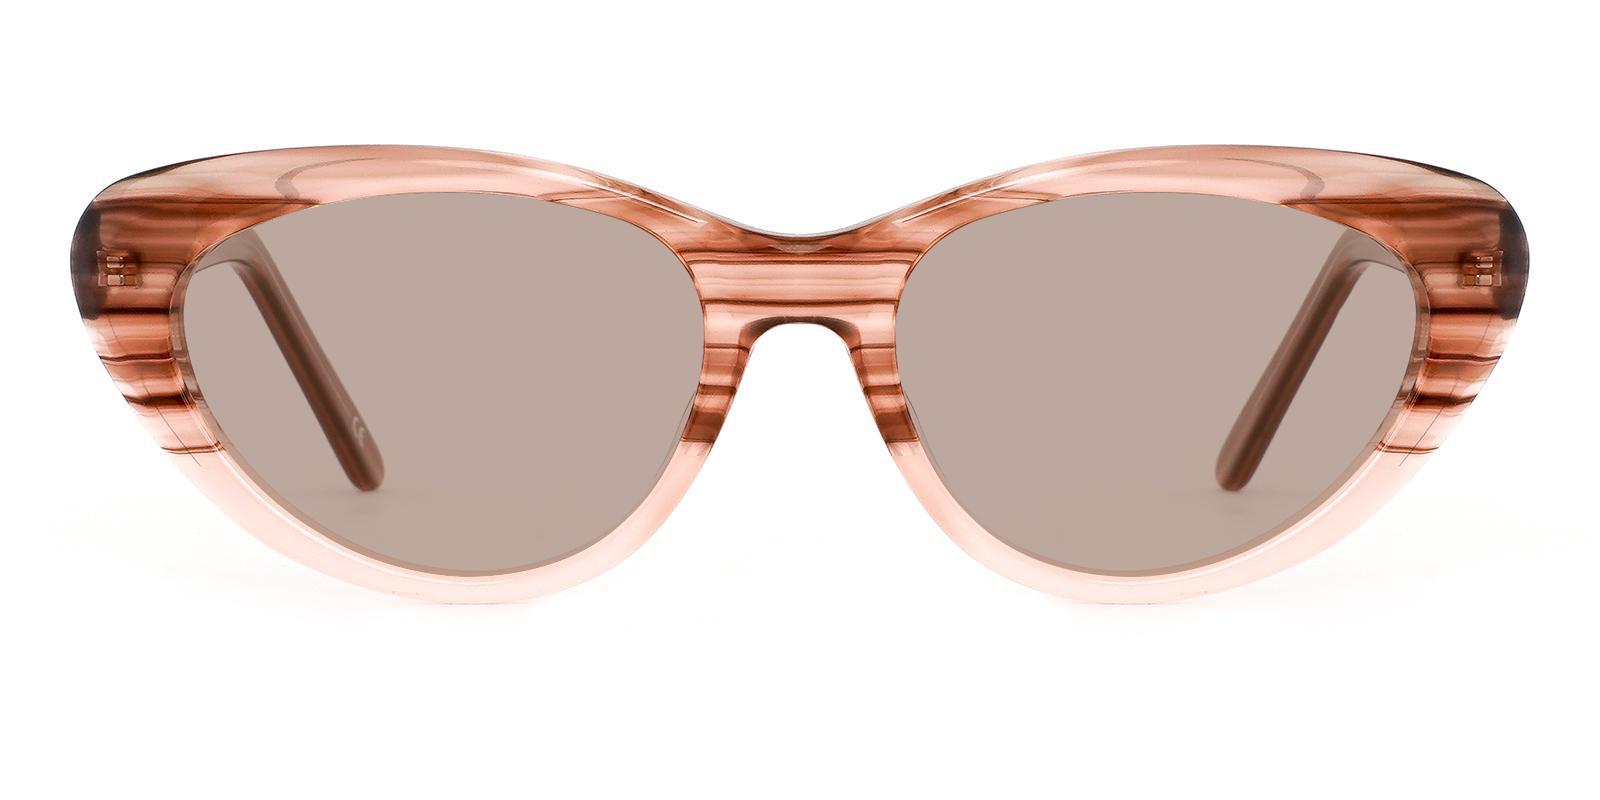 Botanist Cream Acetate SpringHinges , Sunglasses , UniversalBridgeFit Frames from ABBE Glasses